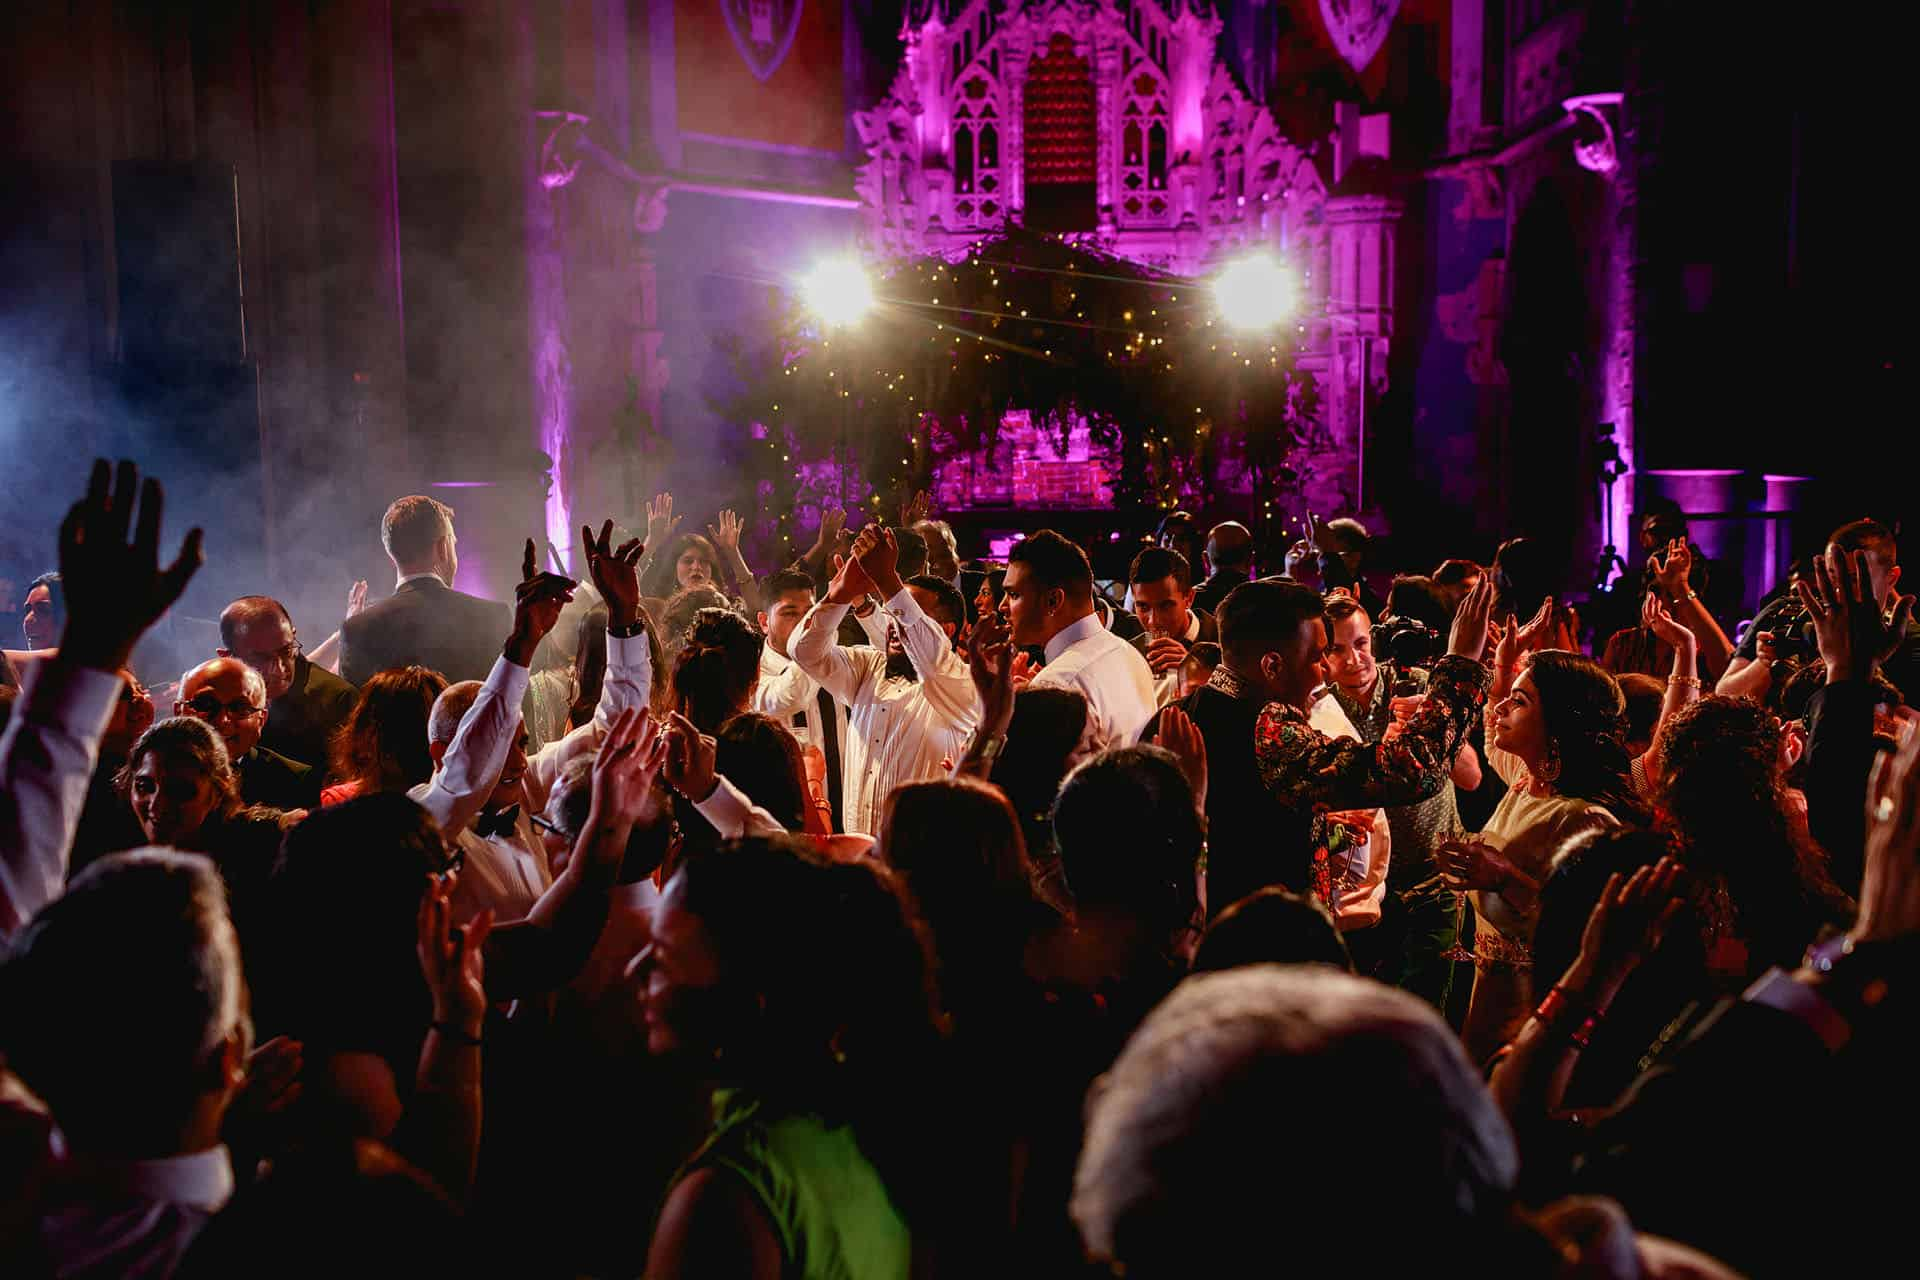 monastery indian wedding reception manchester